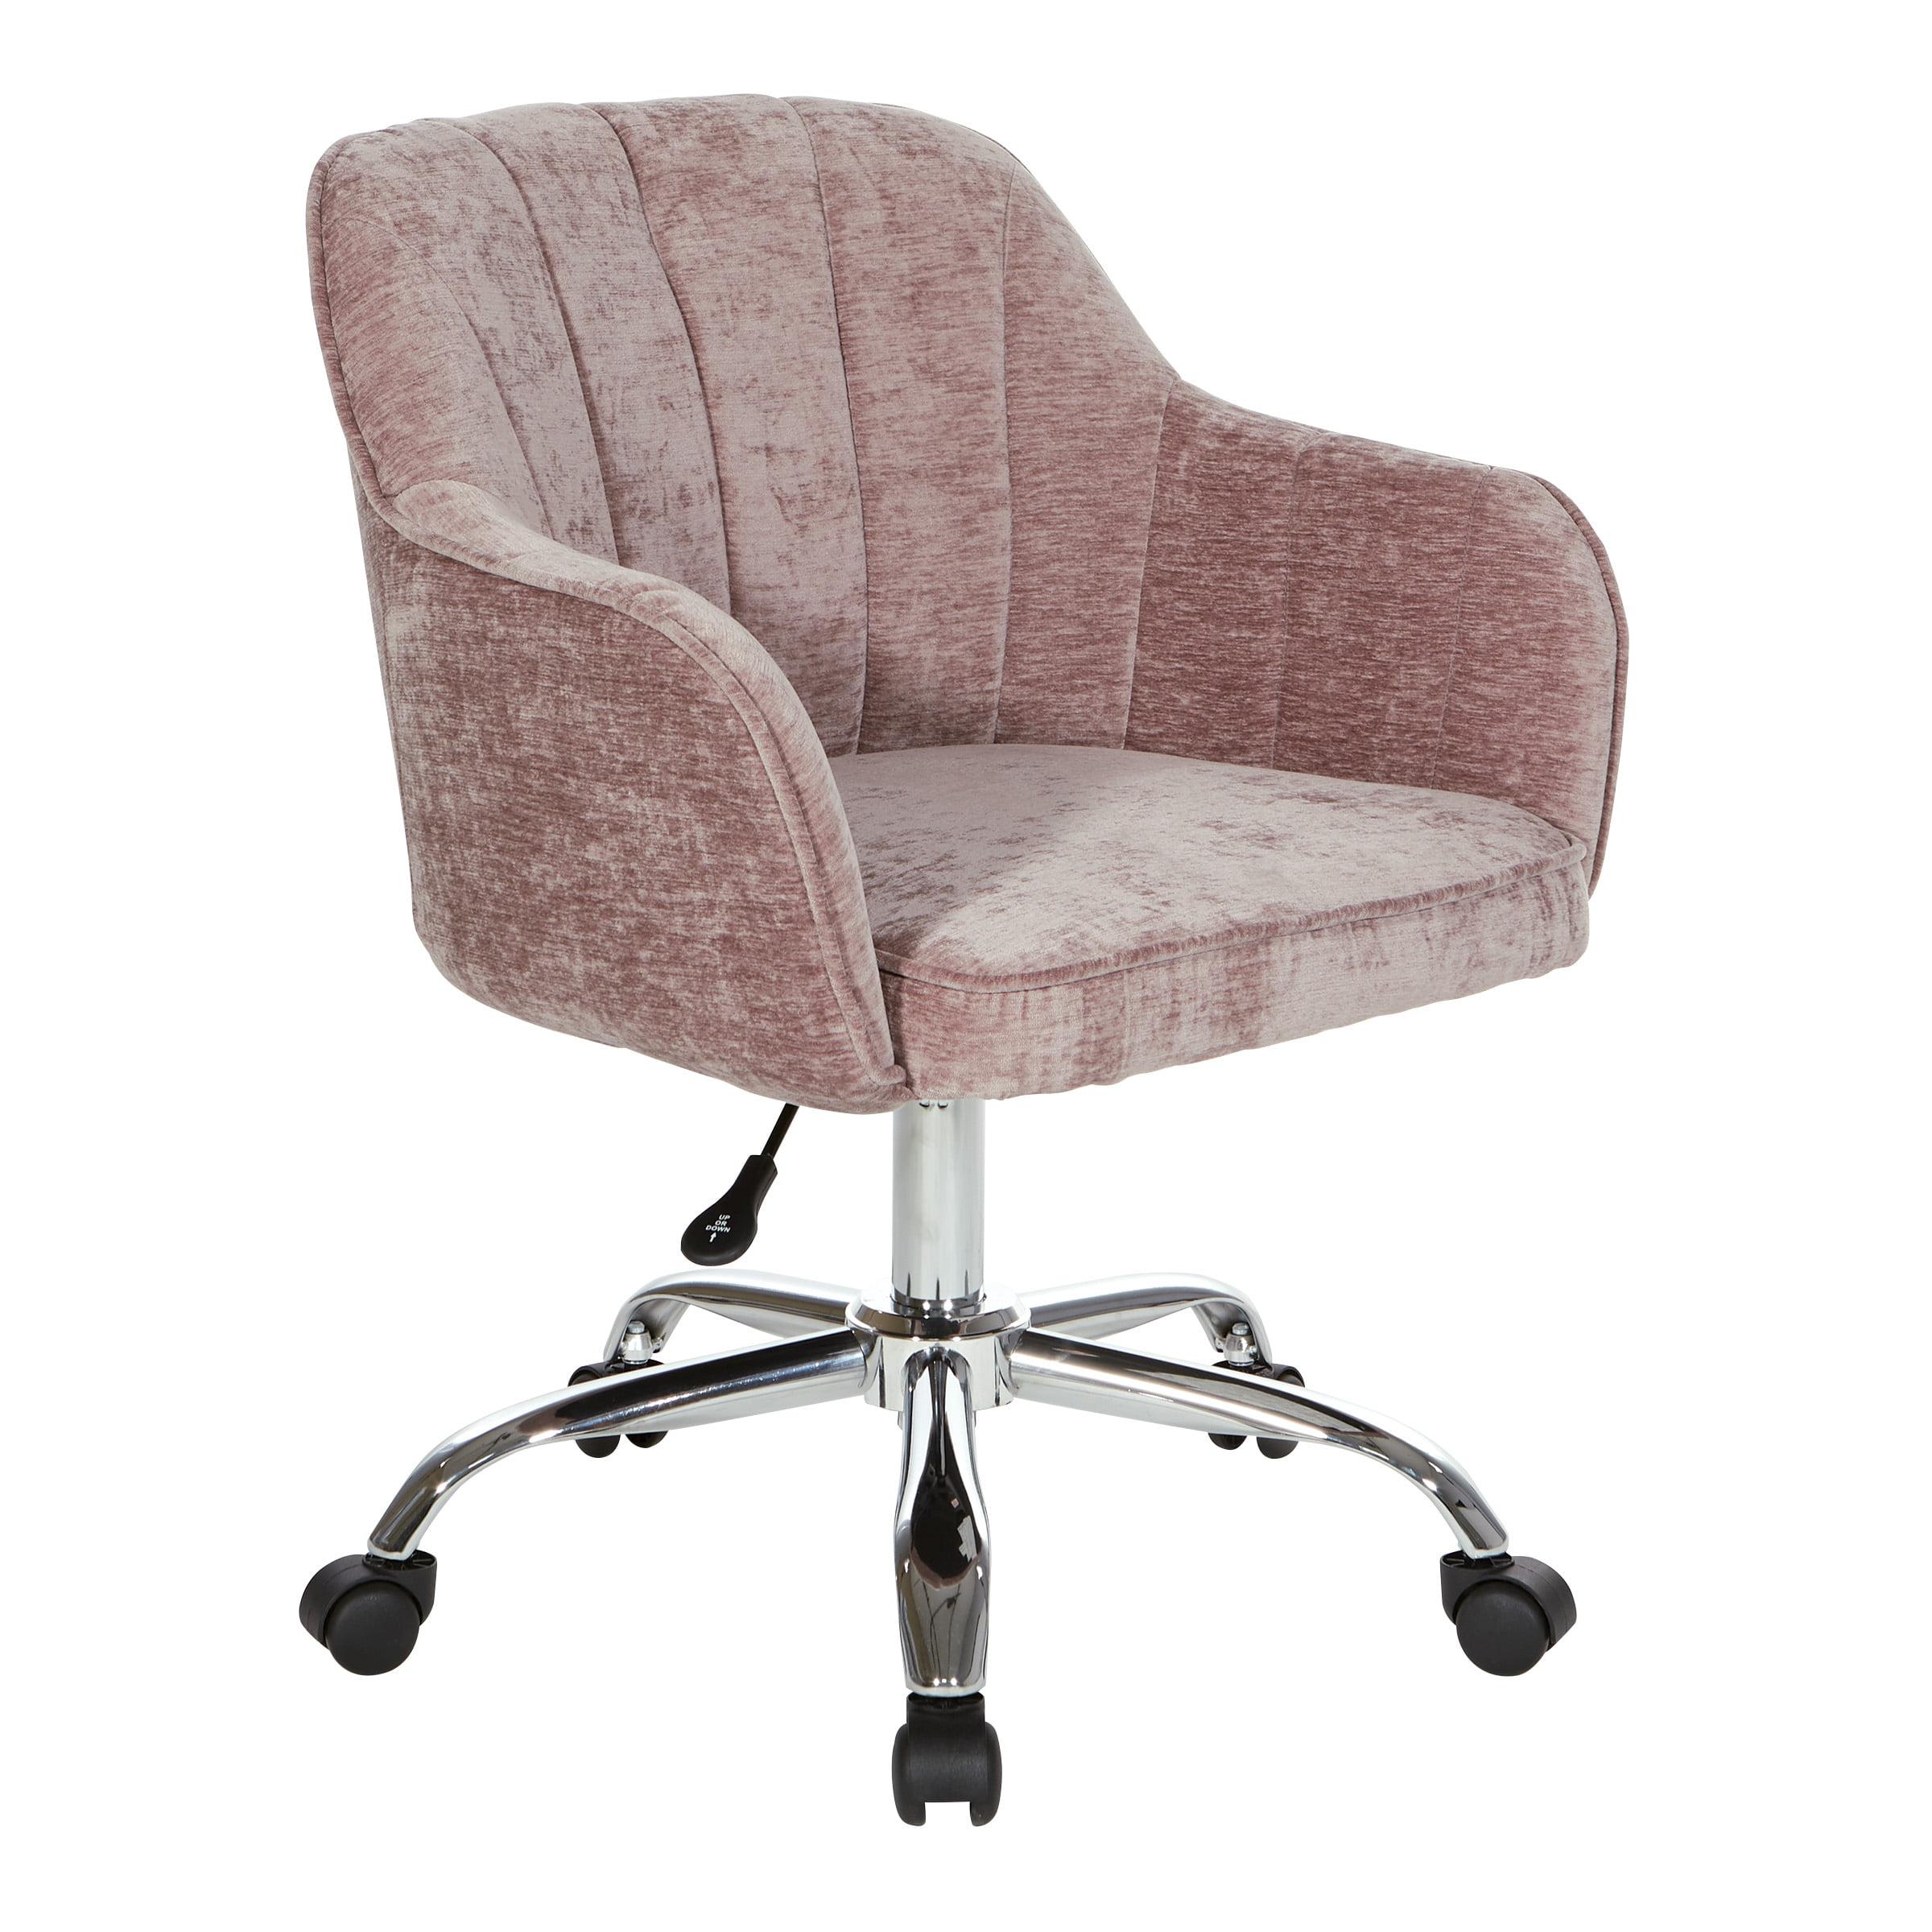 Osp Home Furnishings Versailles Office Chair In Rose Velvet Fabric With Chrome Base Walmart Com Walmart Com